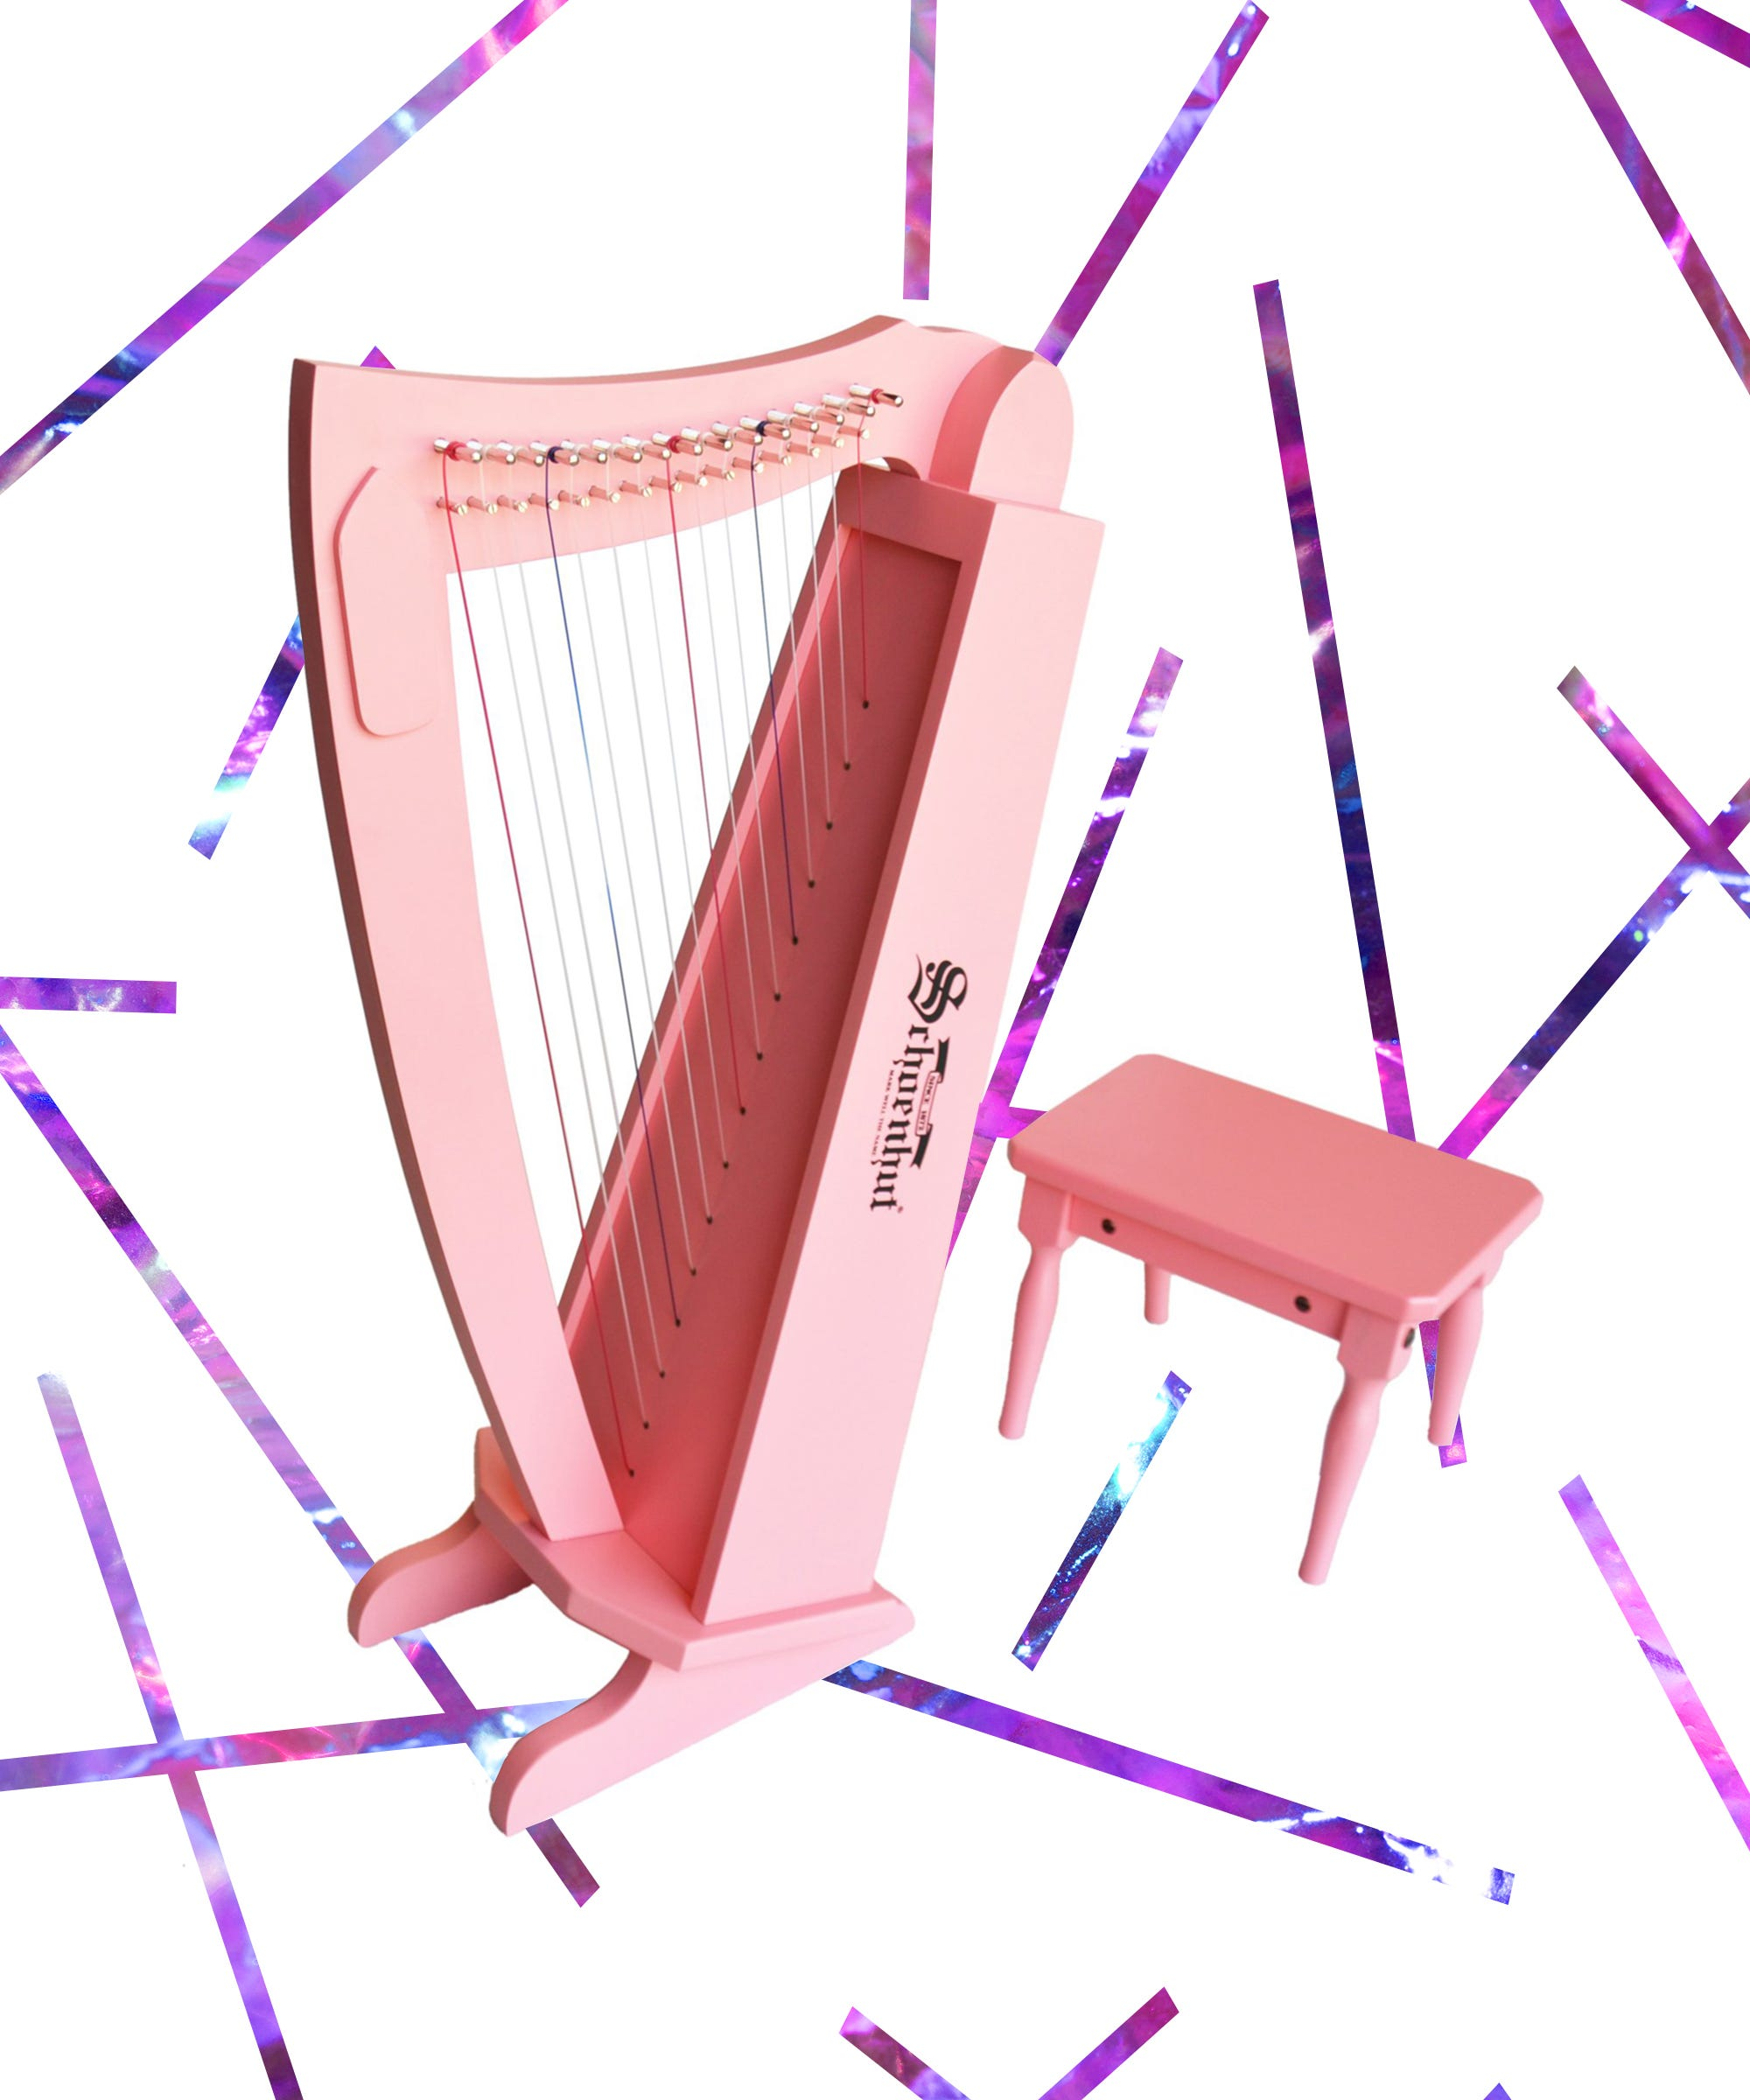 Why Do So Many Celebrity Kids Have Schoenhut Toy Harps?